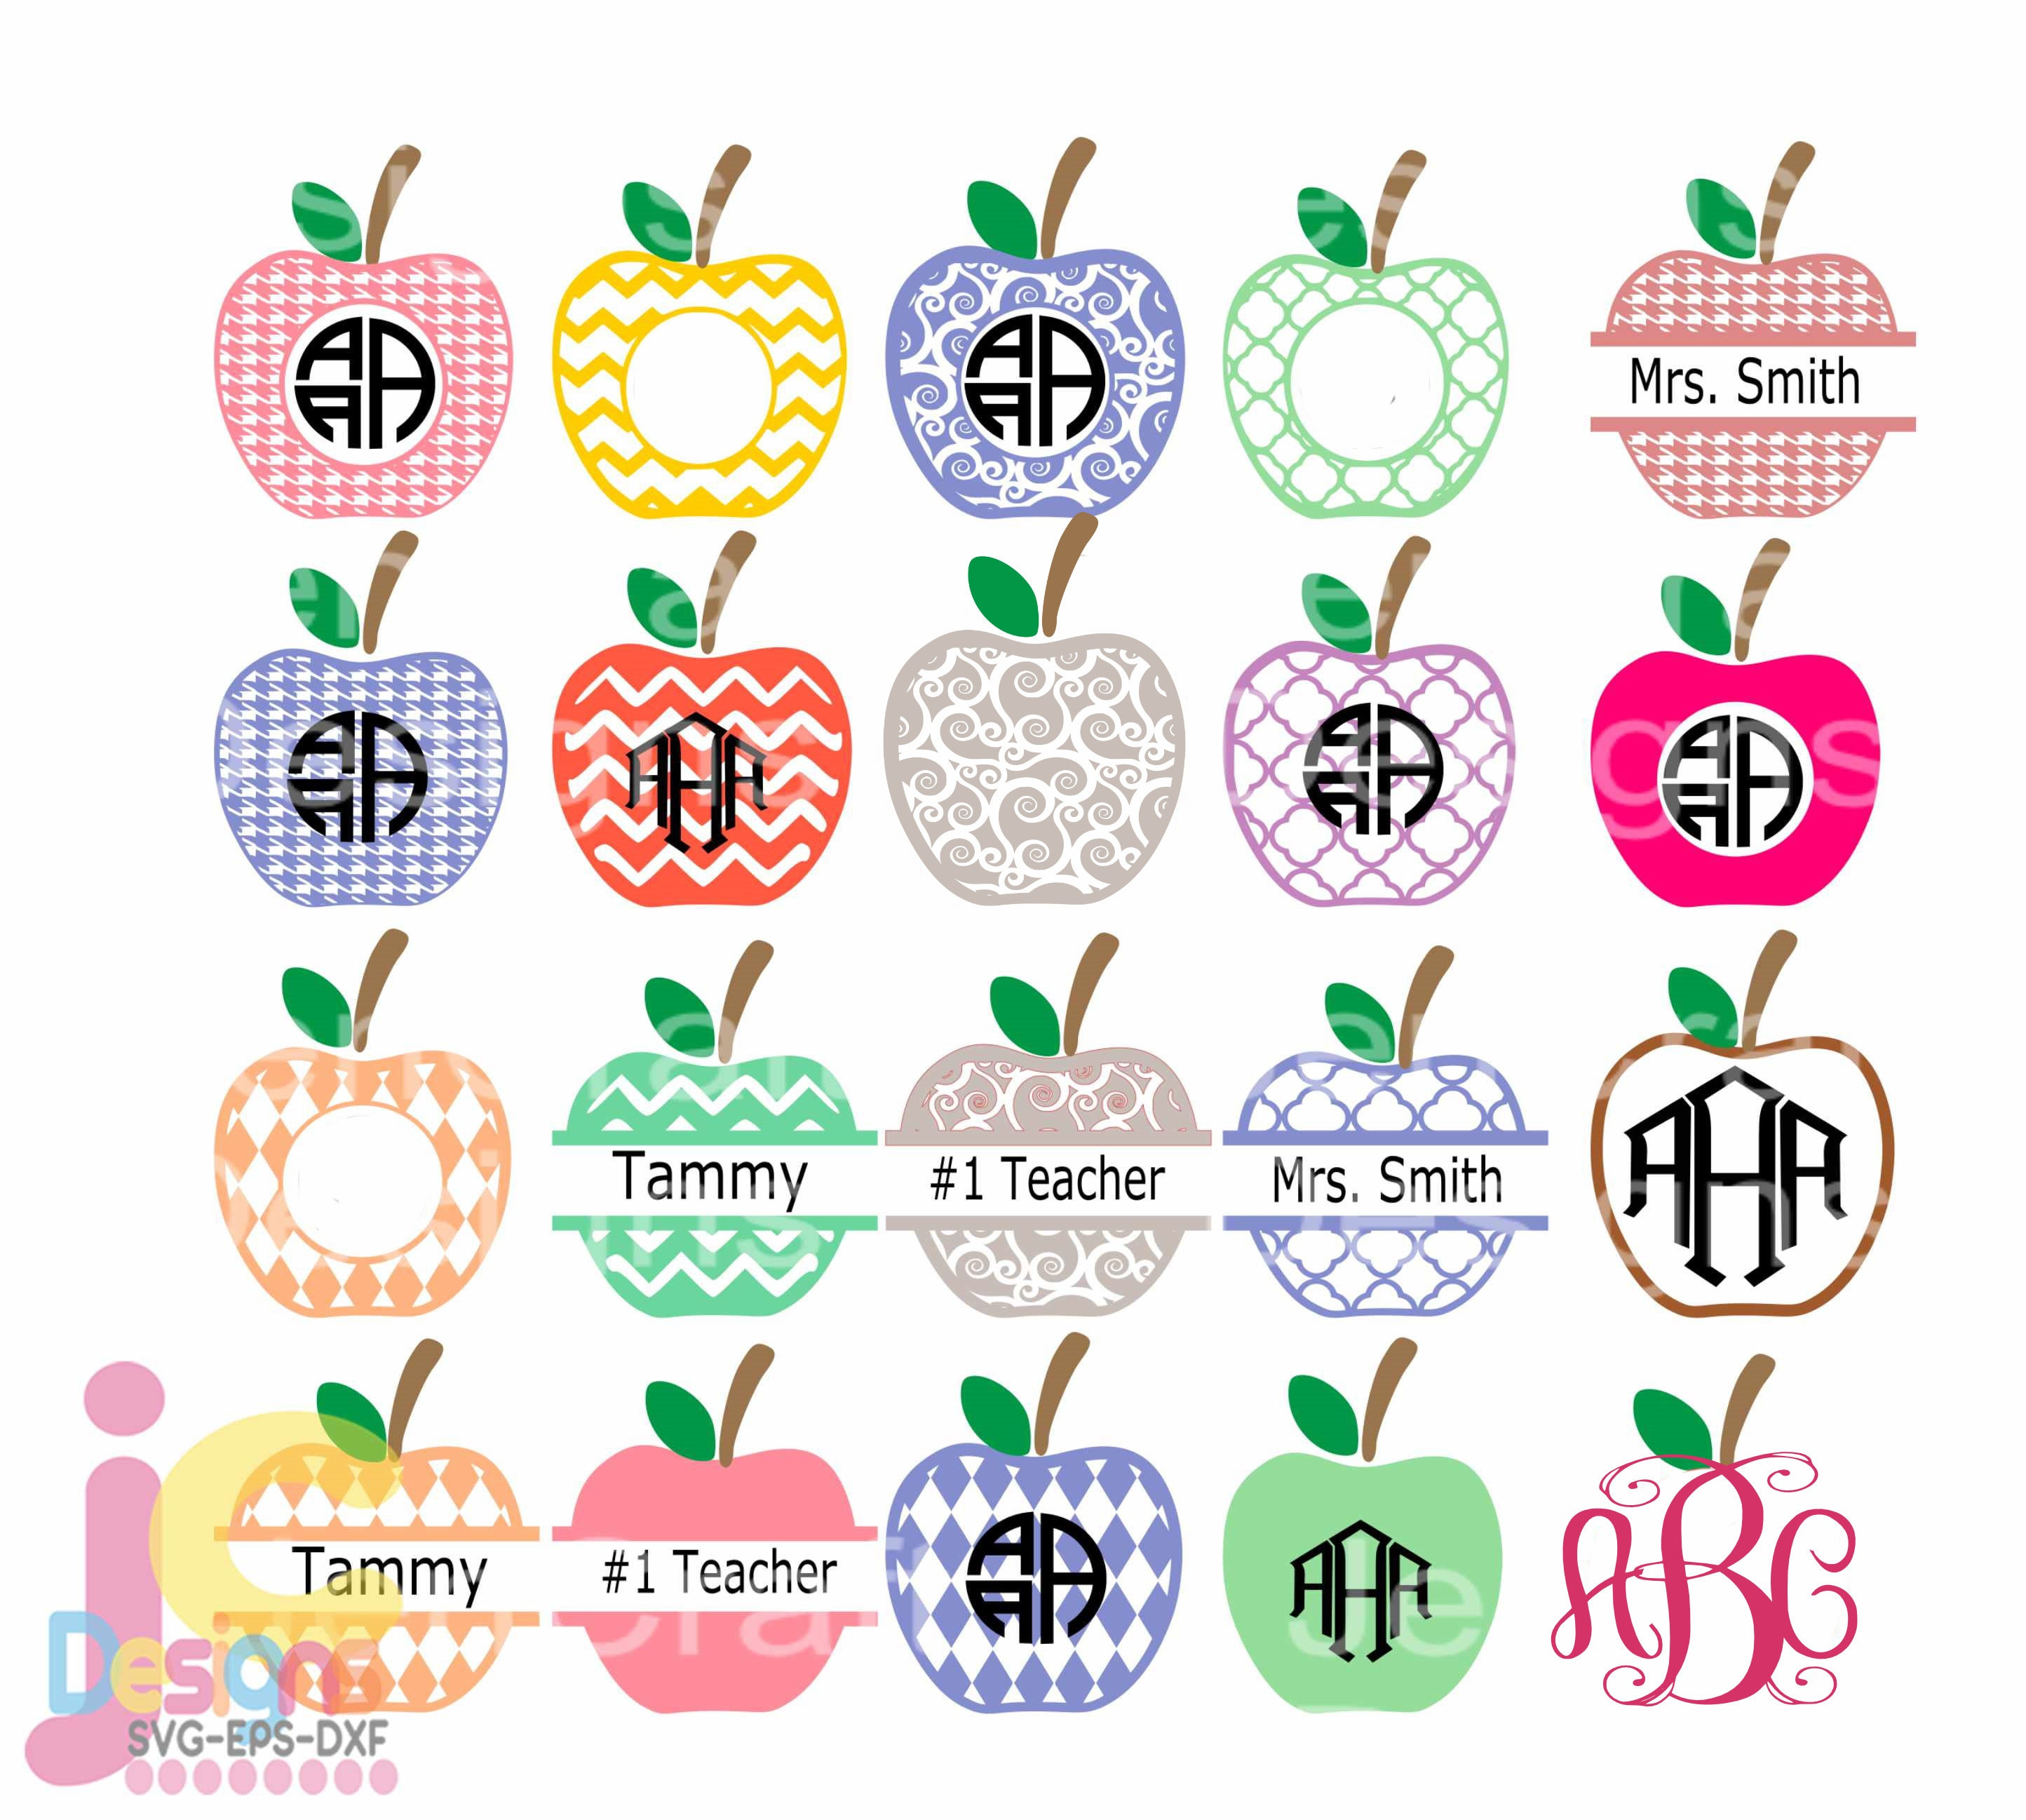 School Apple Svg Frames Teacher Svg Graduation Monogram Frame Class Appreciation Designs For Cricut Bundle Cut Files Svg Dxf Ai Eps Png Jpg